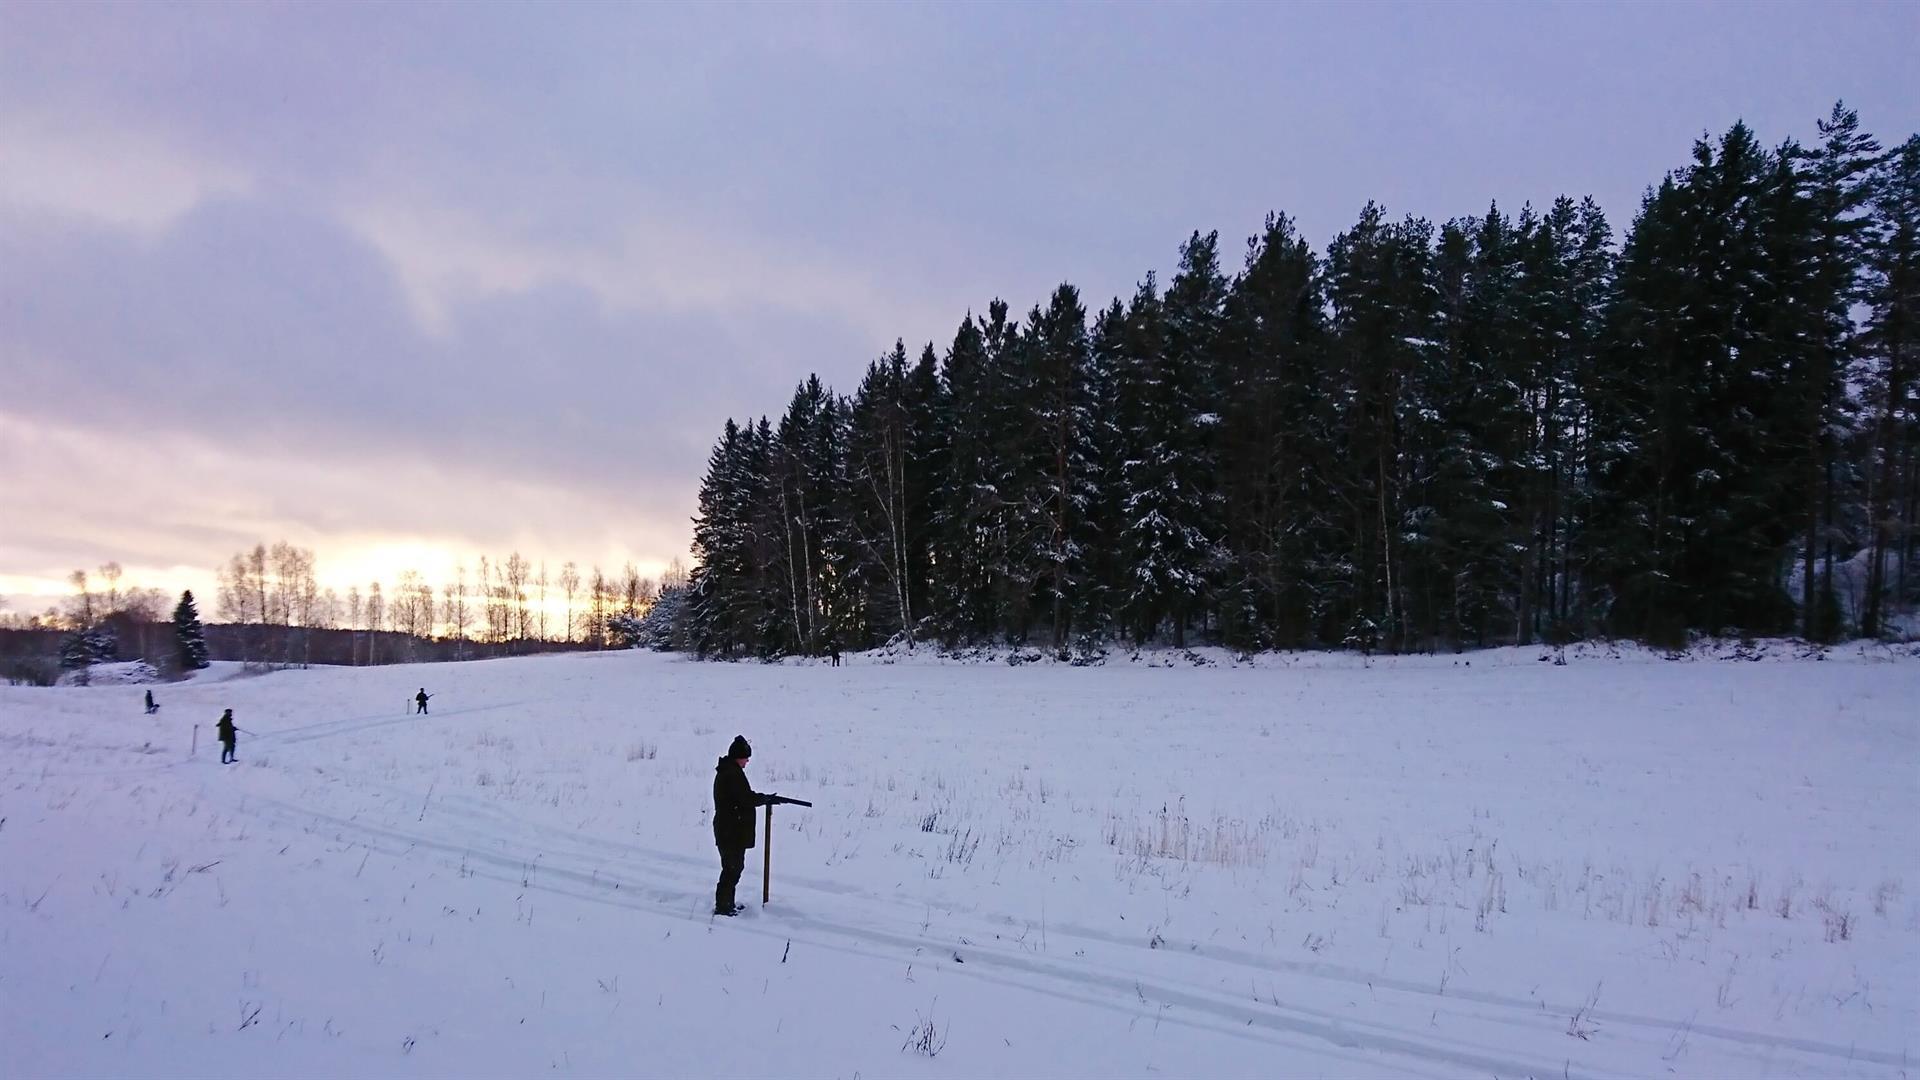 Fasaanijahtia ajojahtina Norrby Gårdissa